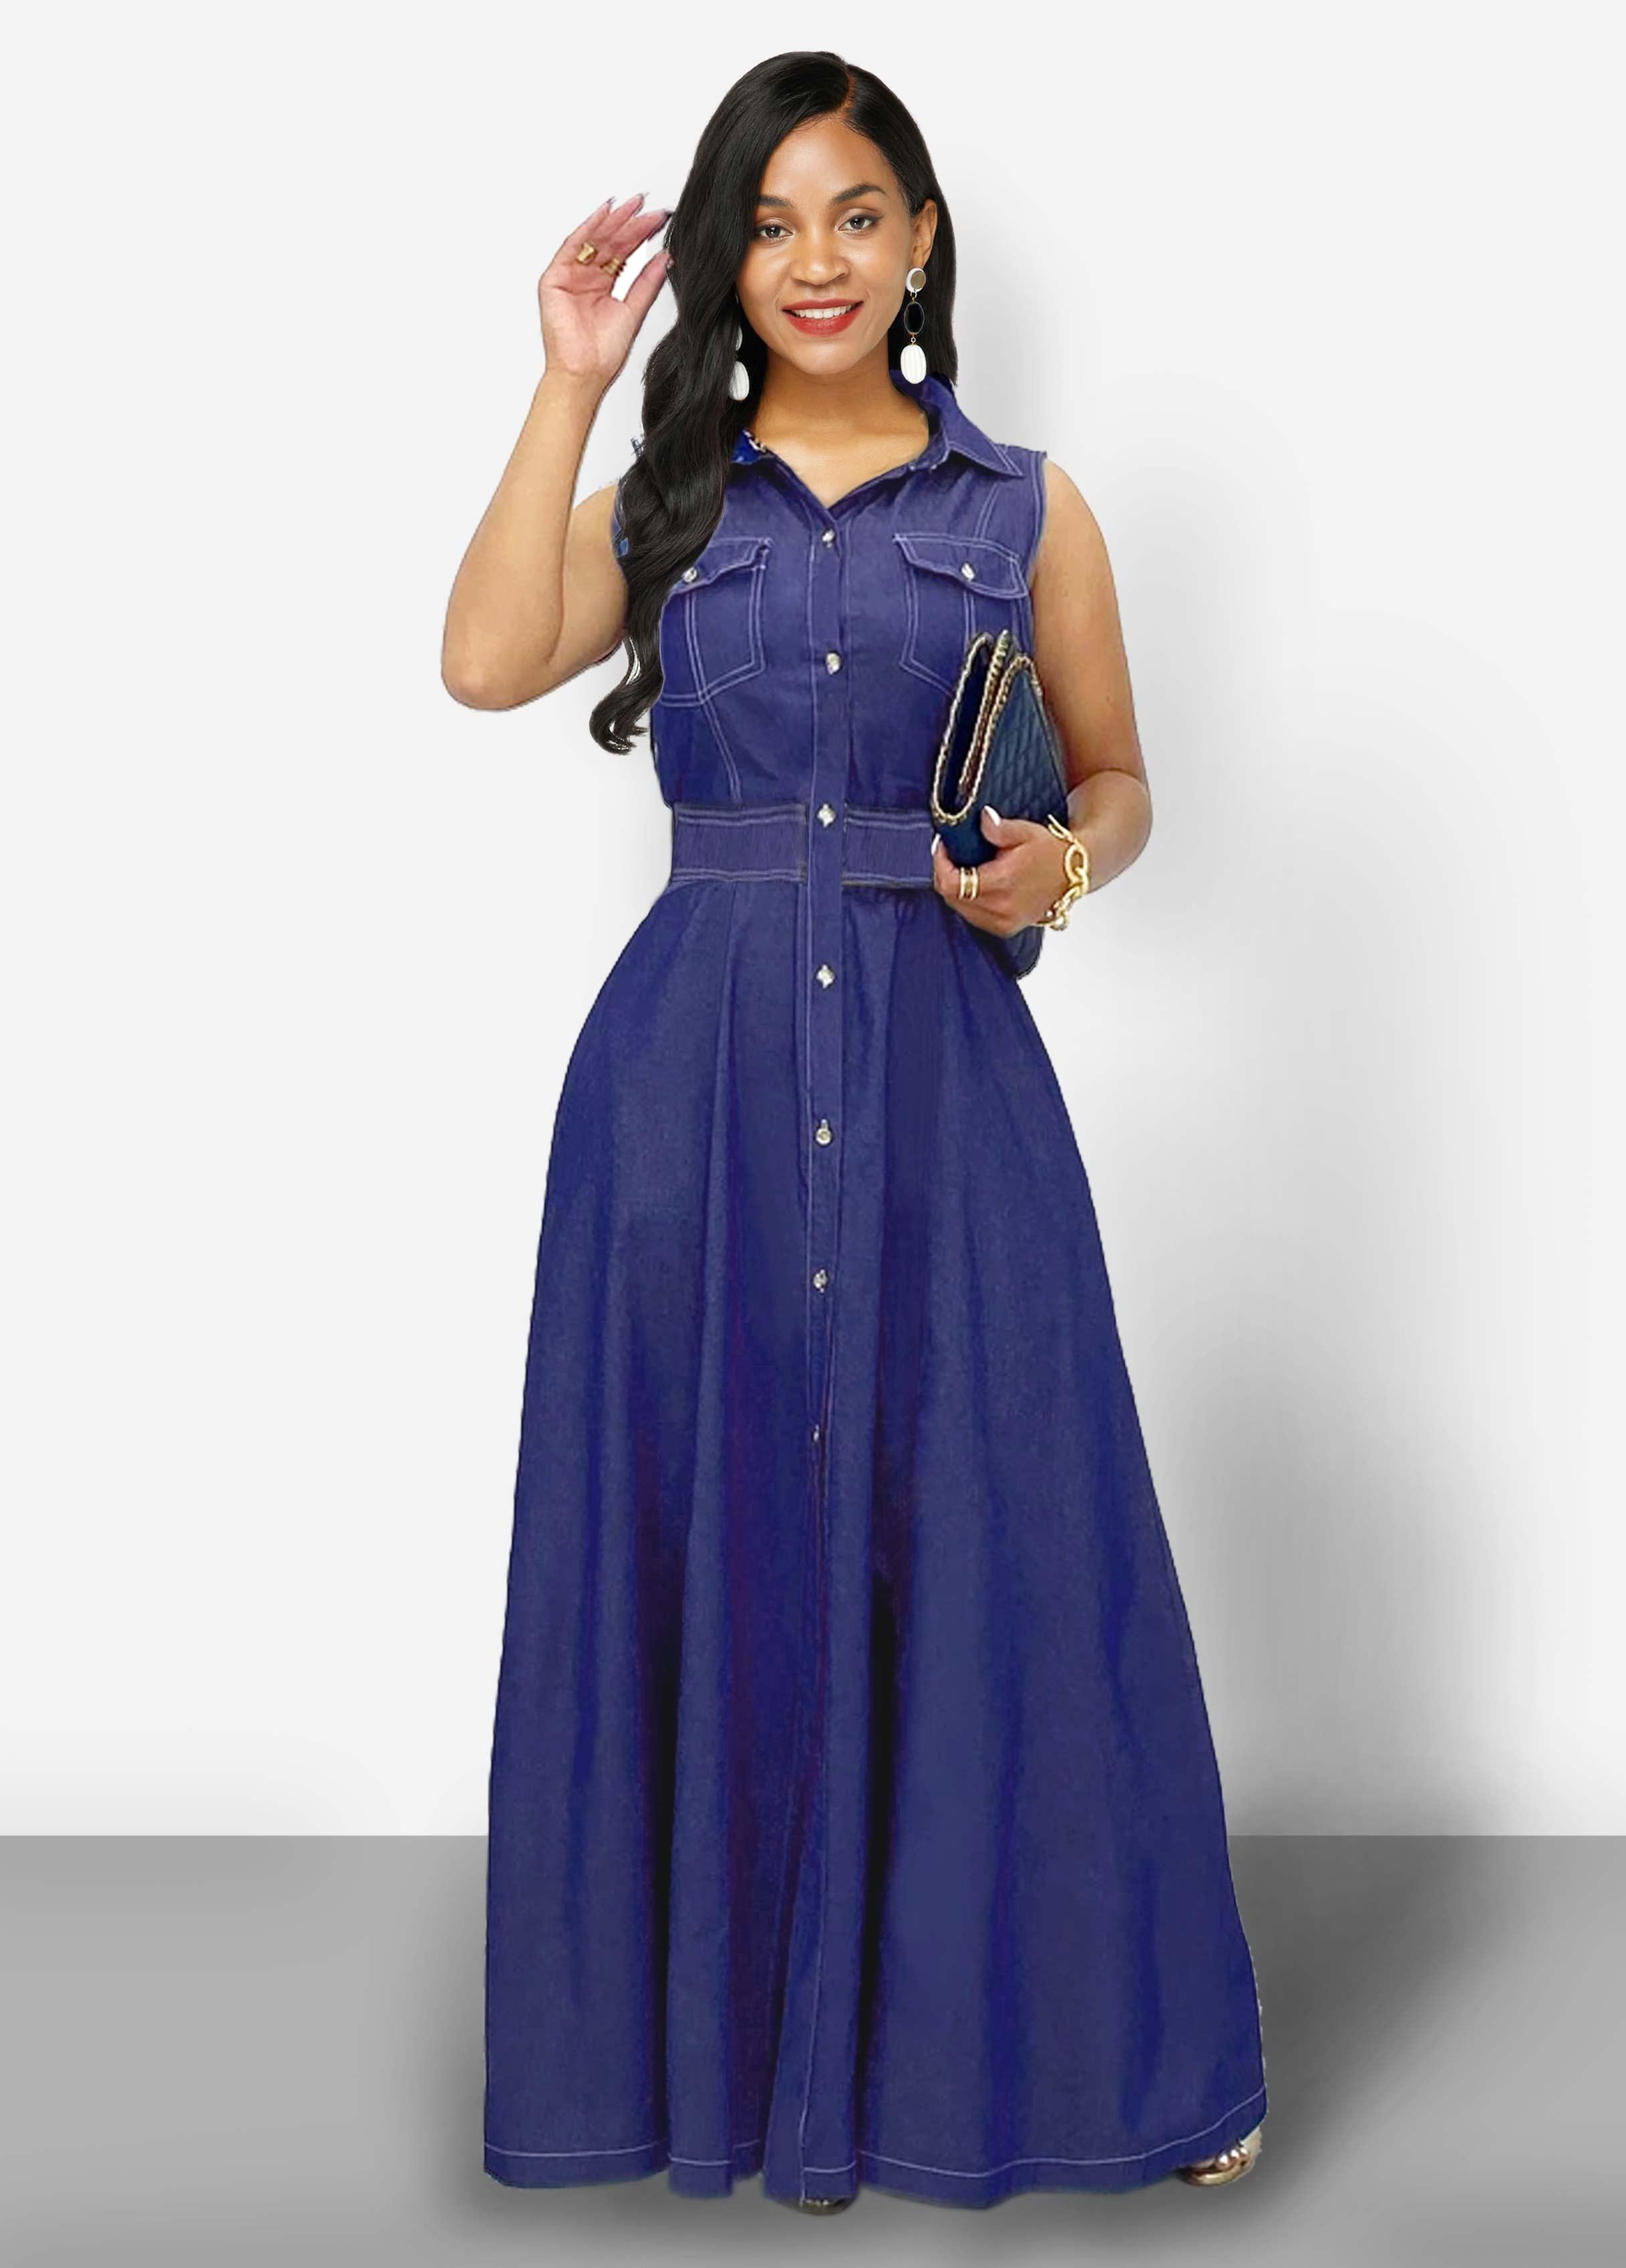 ROTITA Turndown Collar Side Pocket Button Up Denim Dress